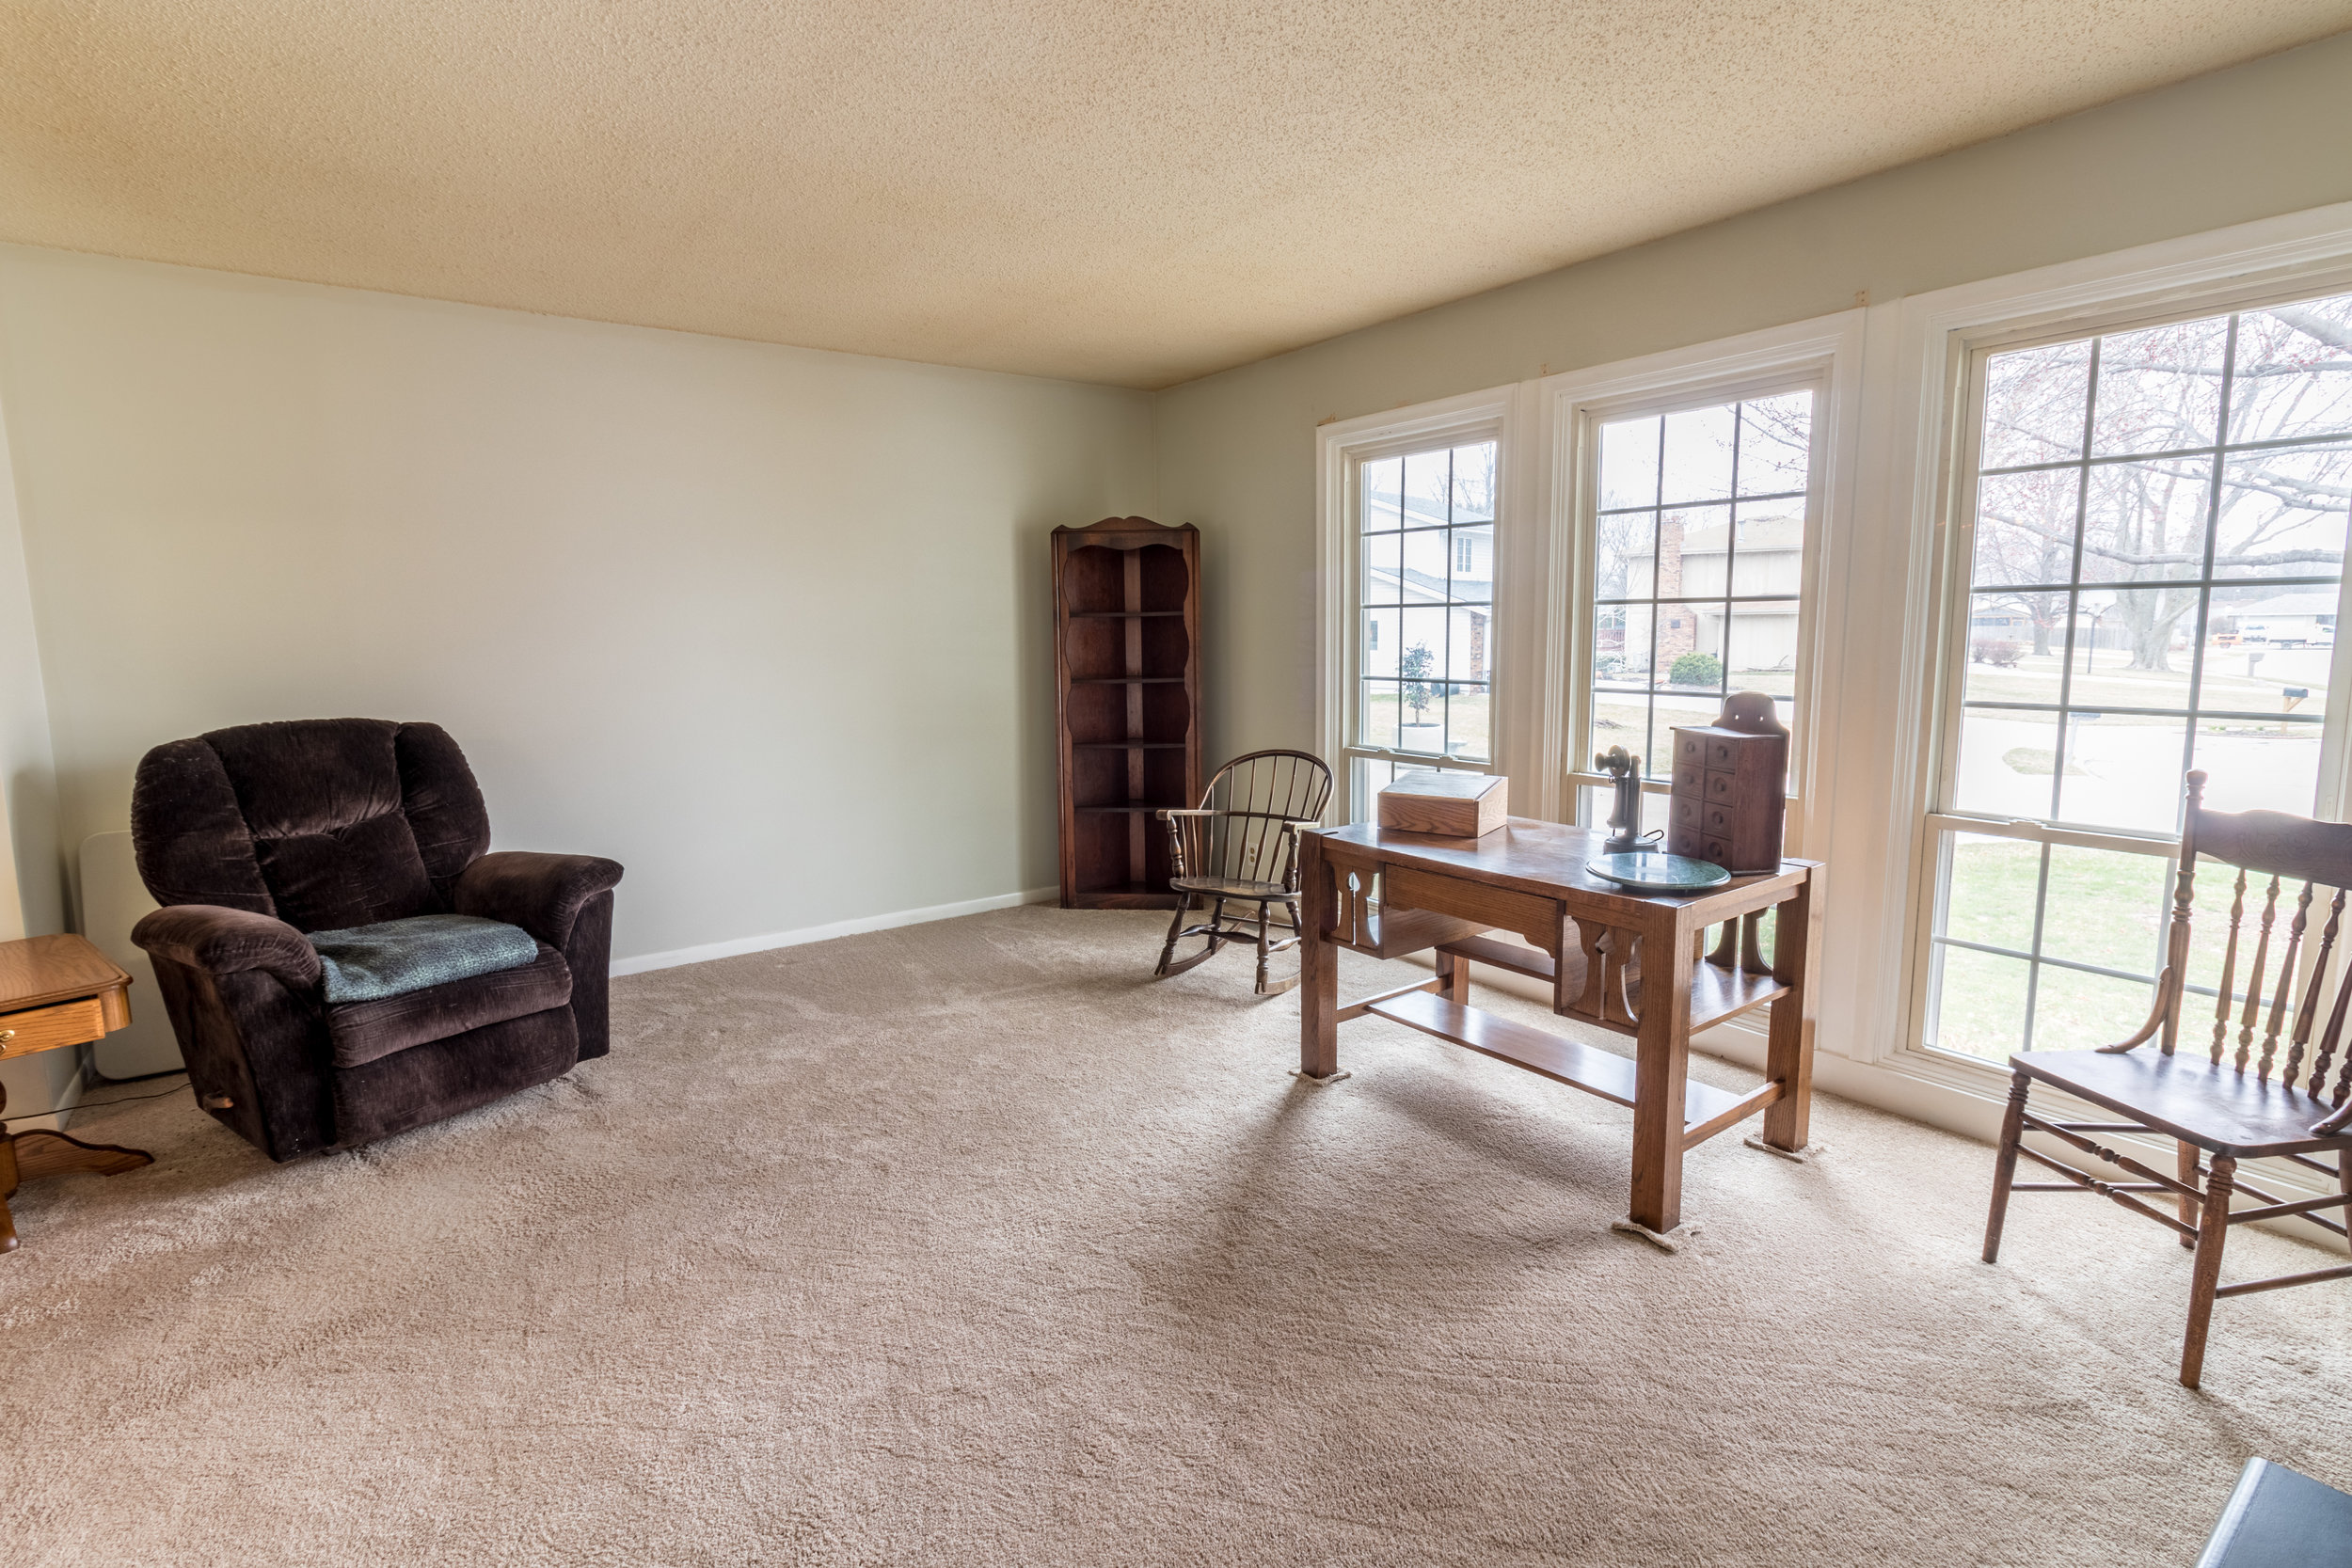 21265 Edgevale Cir living room